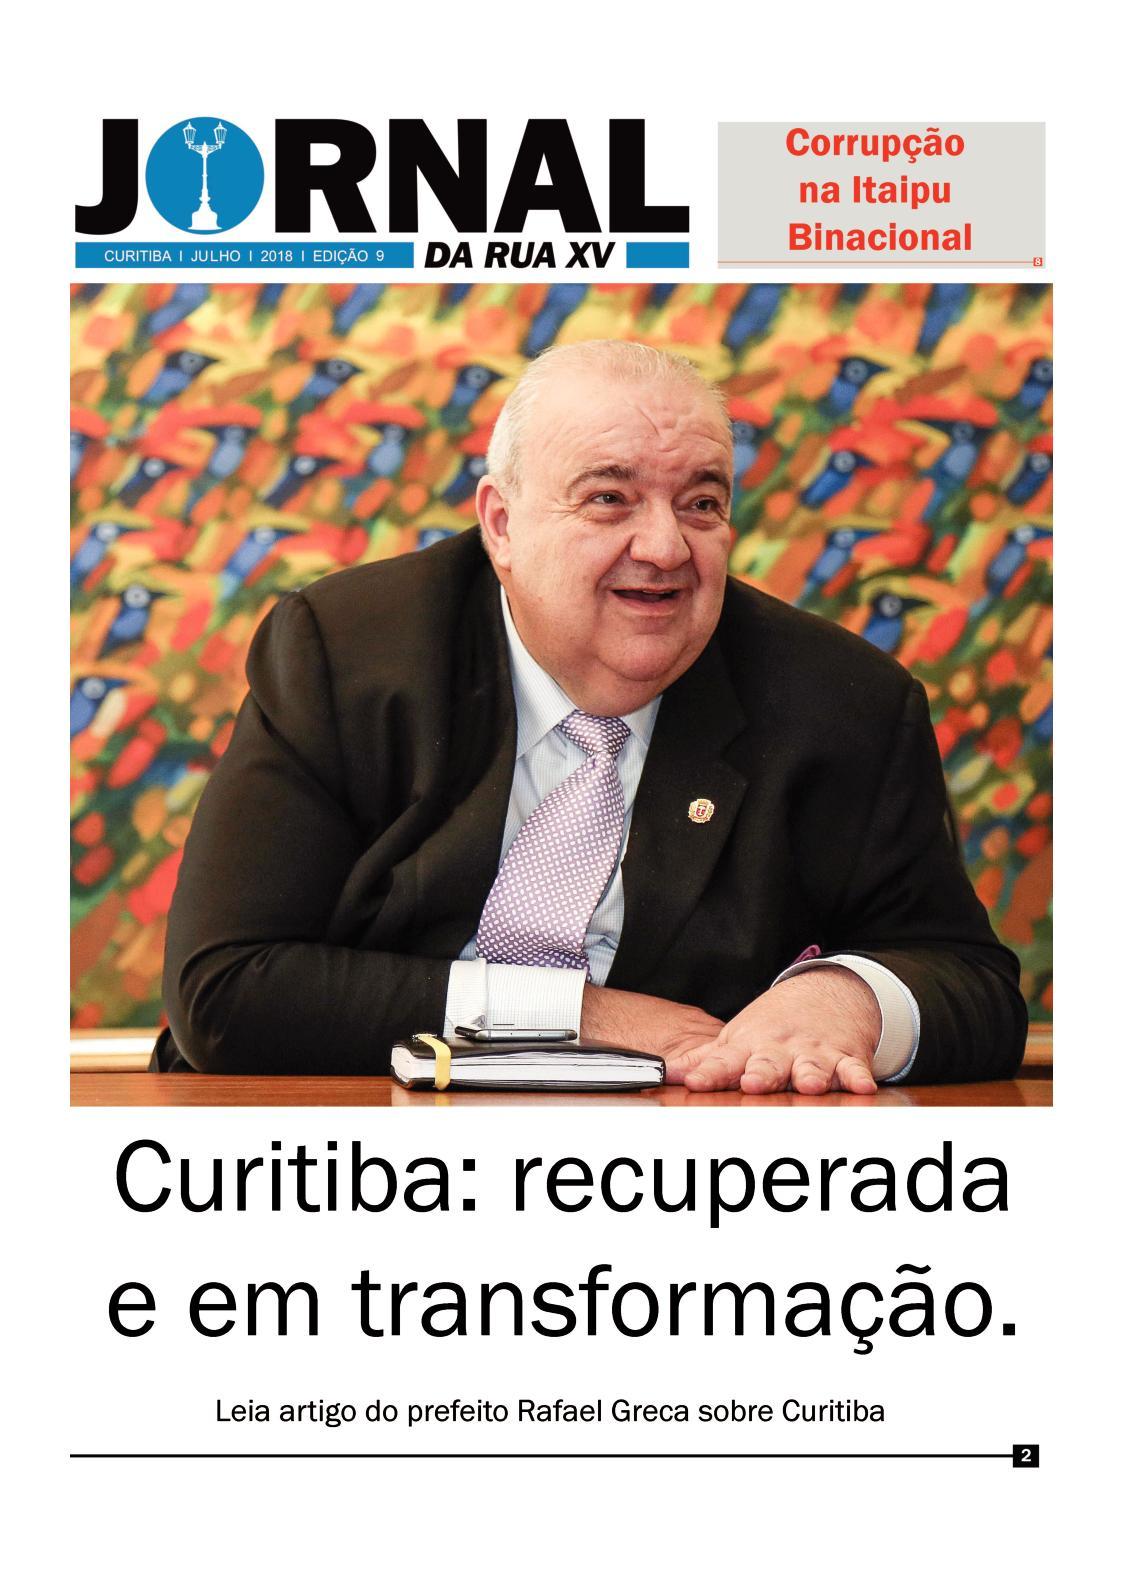 Calaméo - Jornal da Rua XV julho 2018 5f823b8deee